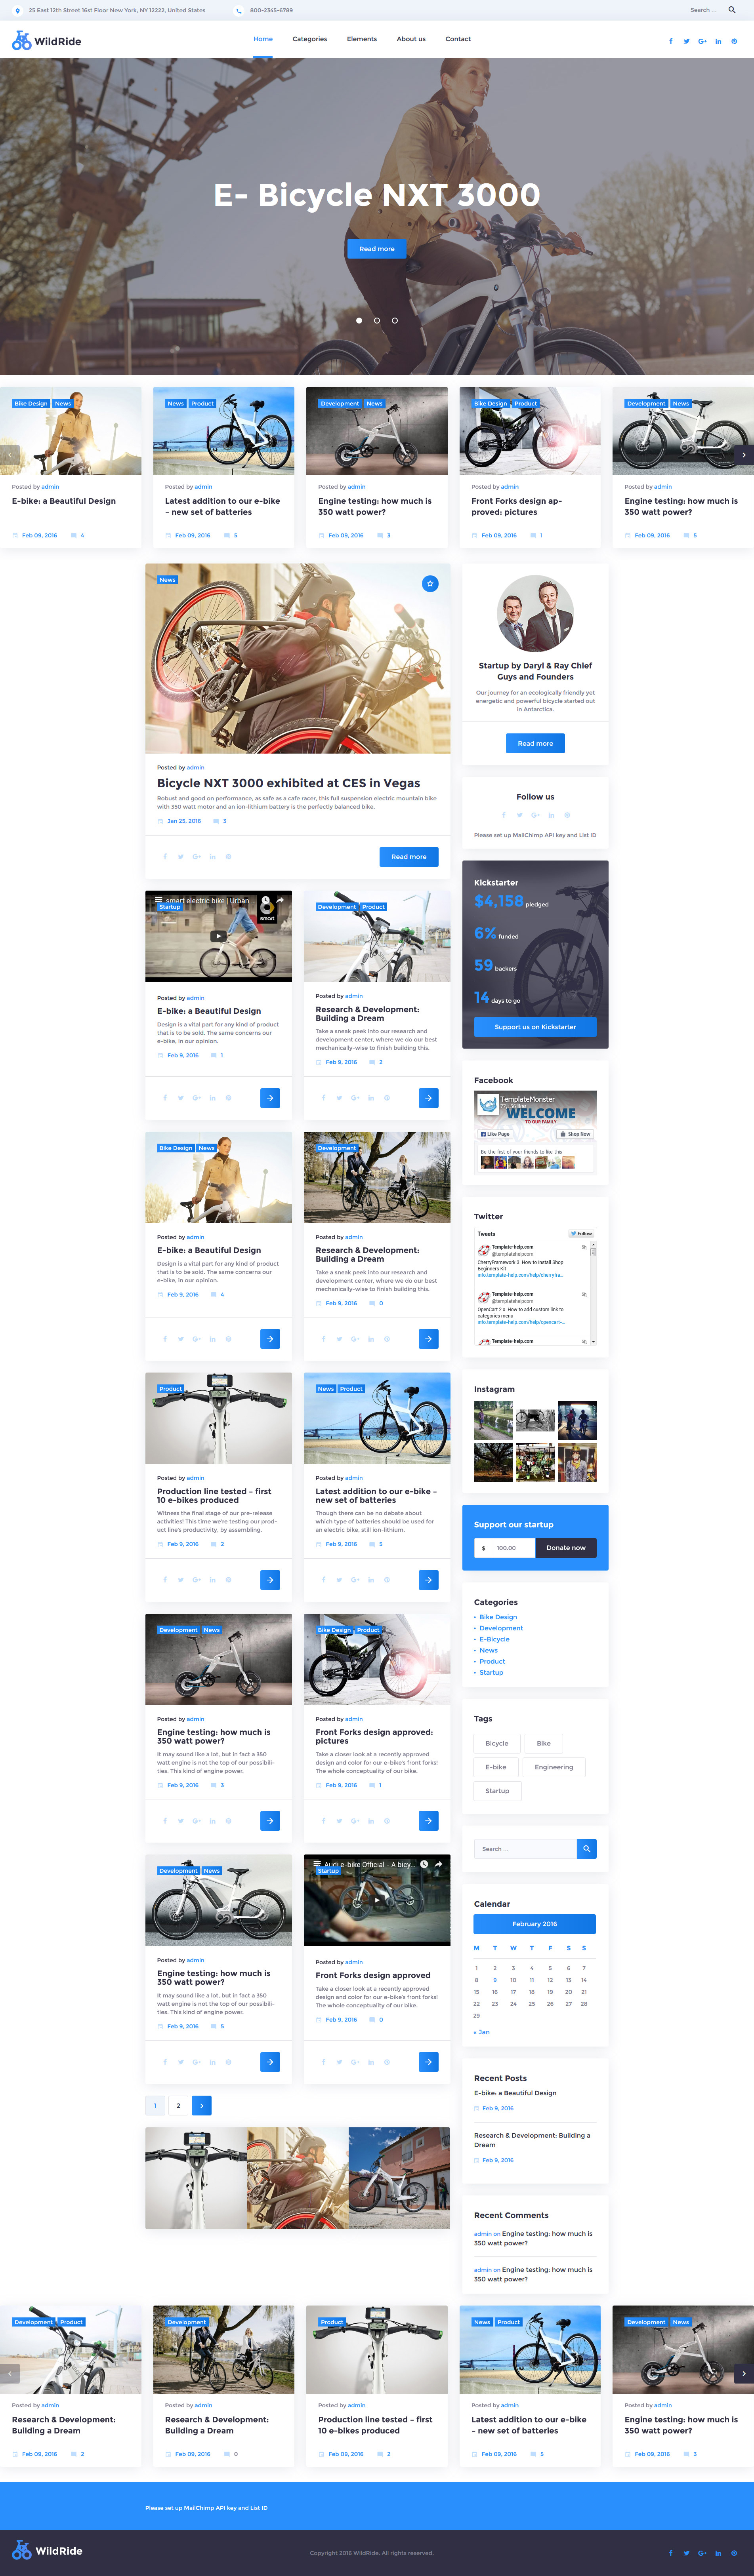 Cycling Responsive WordPress Theme #58378 http://www.templatemonster.com/wordpress-themes/58378.html #theme #byke #sport #clean #grid